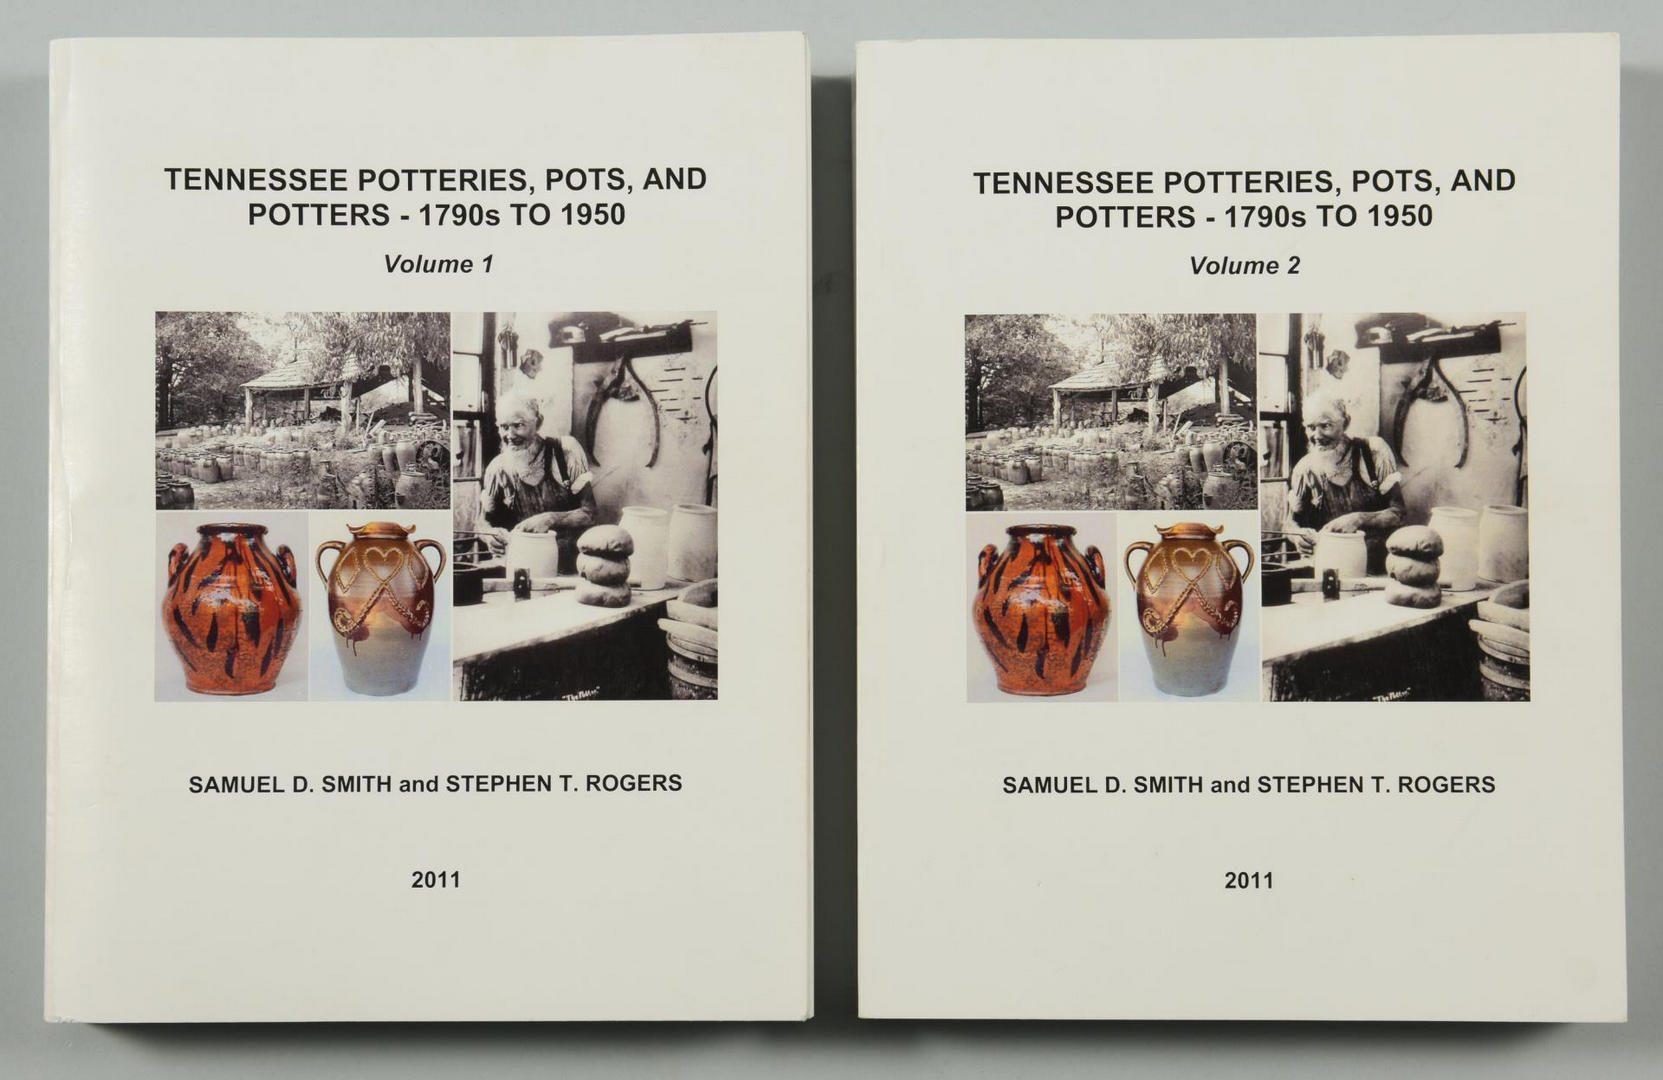 Lot 168: Tennessee Potteries, Pots and Potters, Vols. I & II